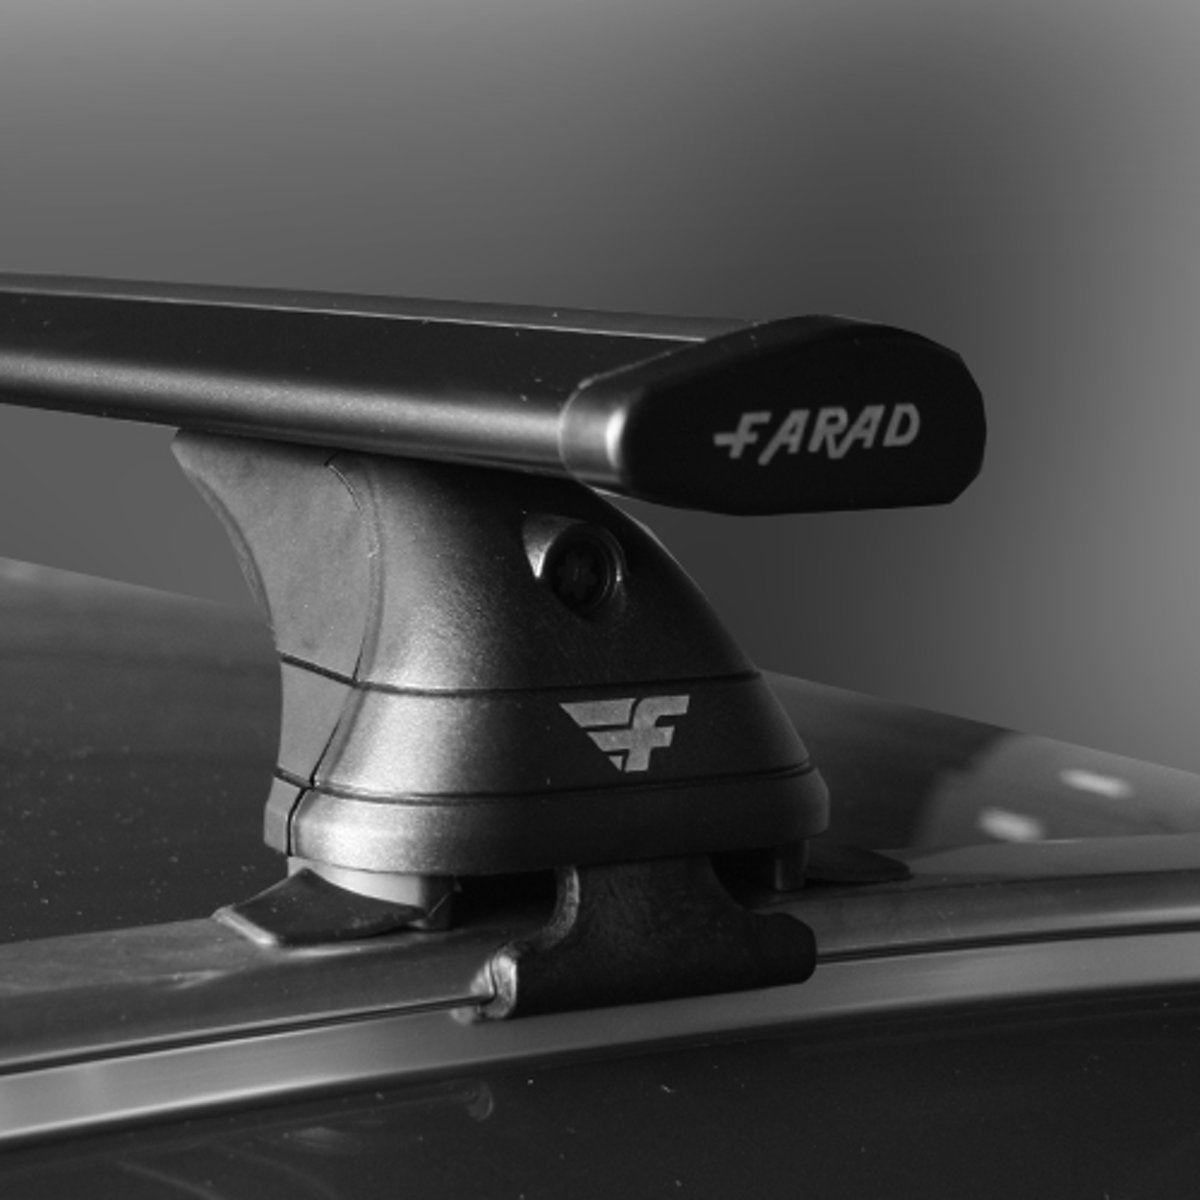 Dakdragers Infiniti QX30 5 deurs hatchback vanaf 2016 - Farad aluminium wingbar zwart kopen